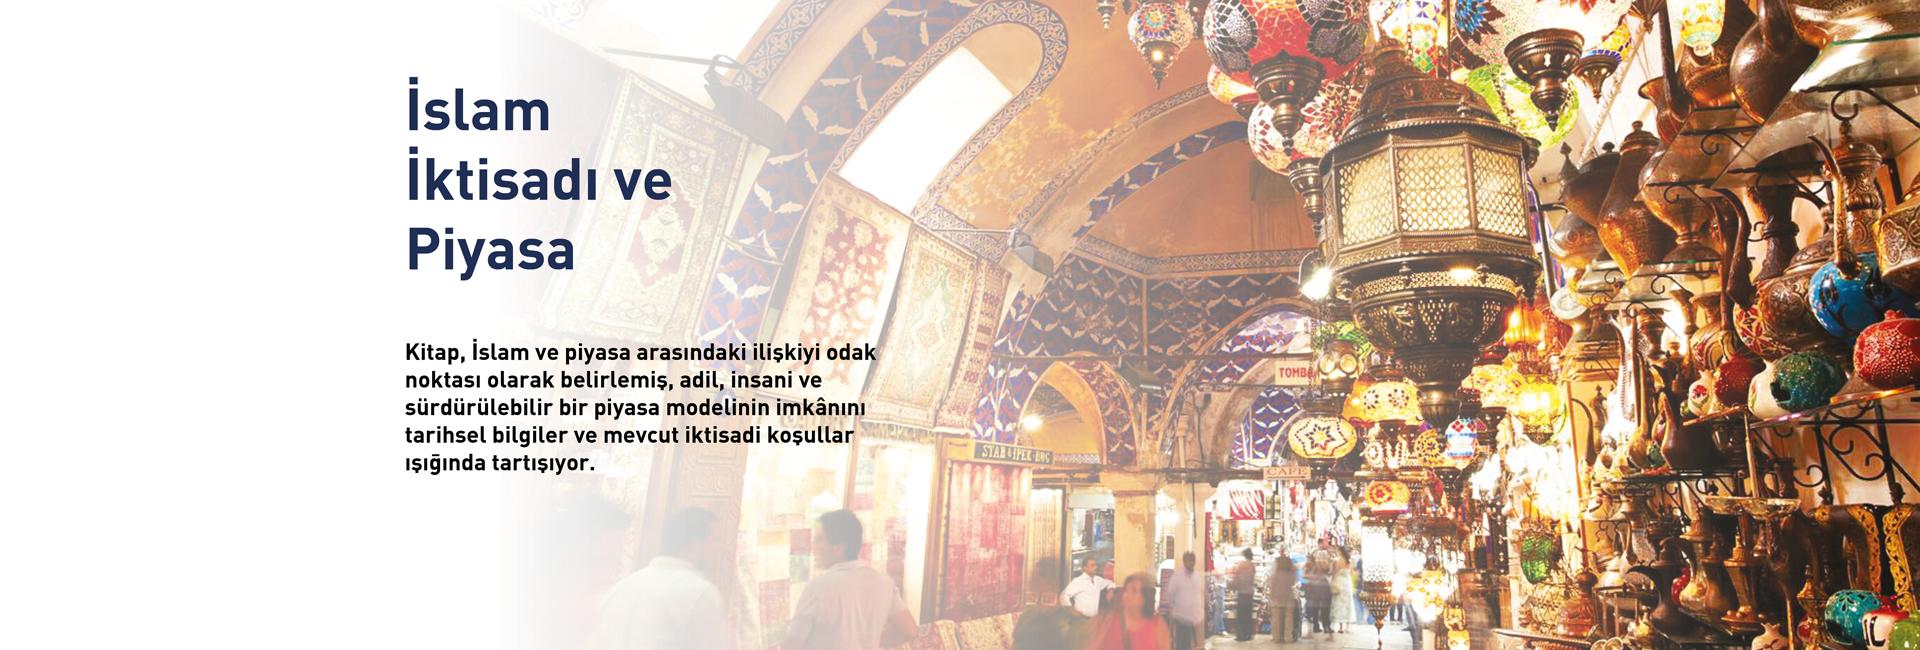 http://iktisatyayinlari.com/content/1-home/iktisaty_web6.jpg